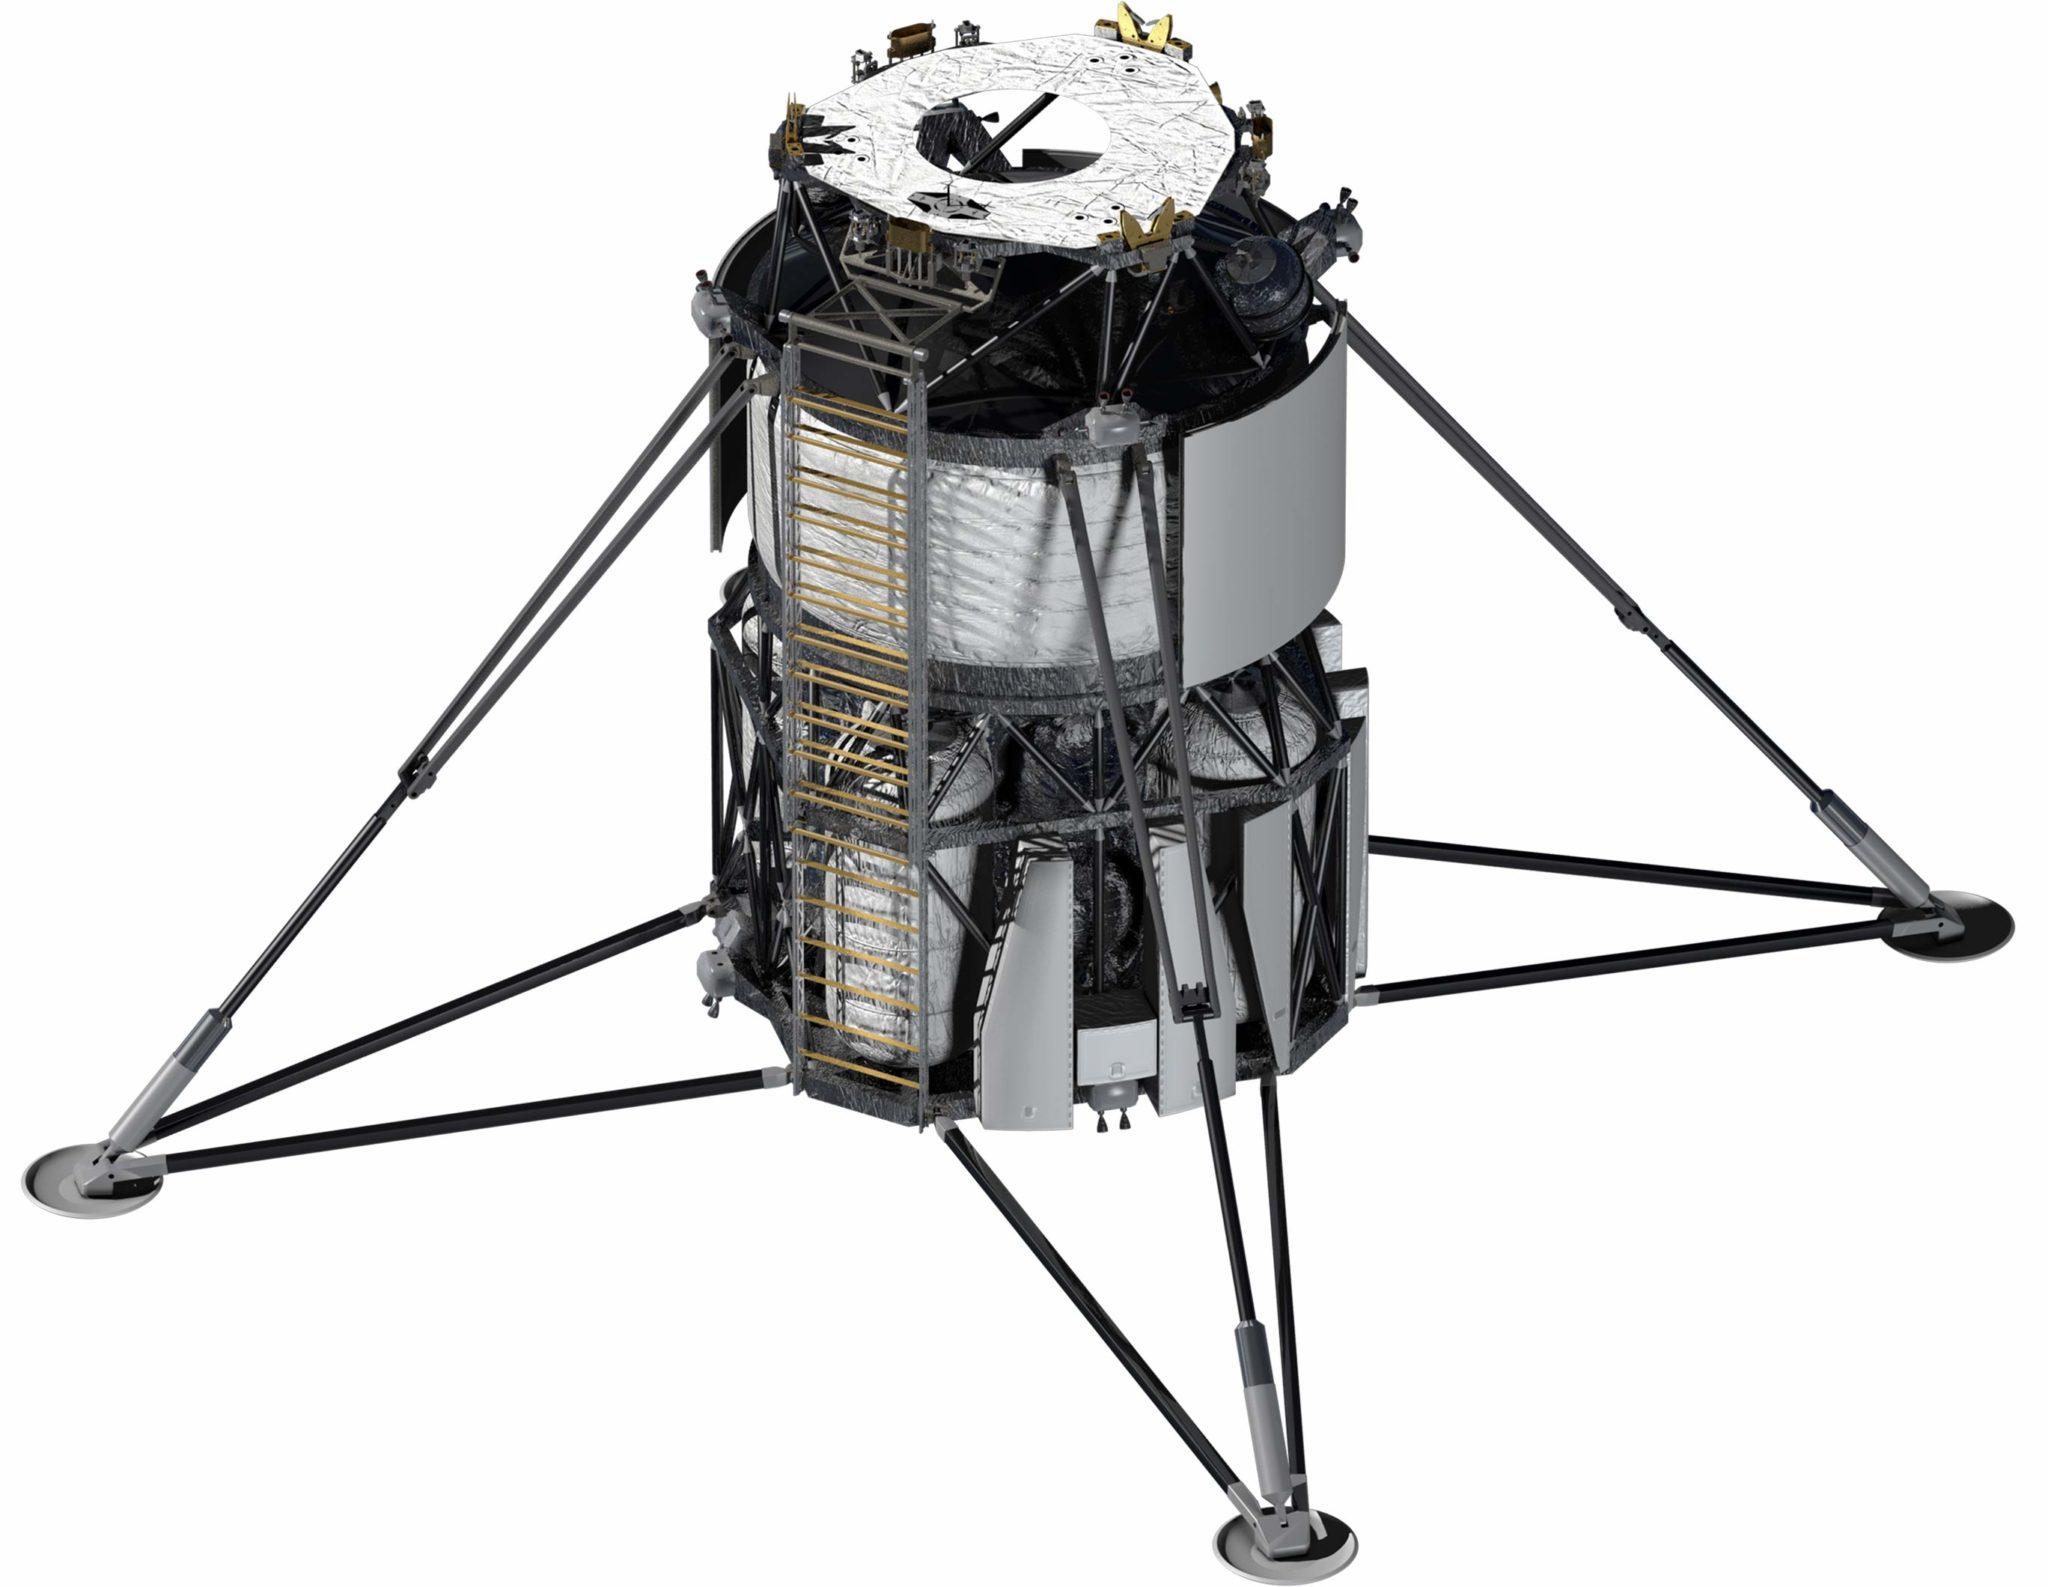 Blue Origin正在提供基于蓝月亮货月球着陆器及其BE-7发动机的下降元素,该技术已经开发了三年